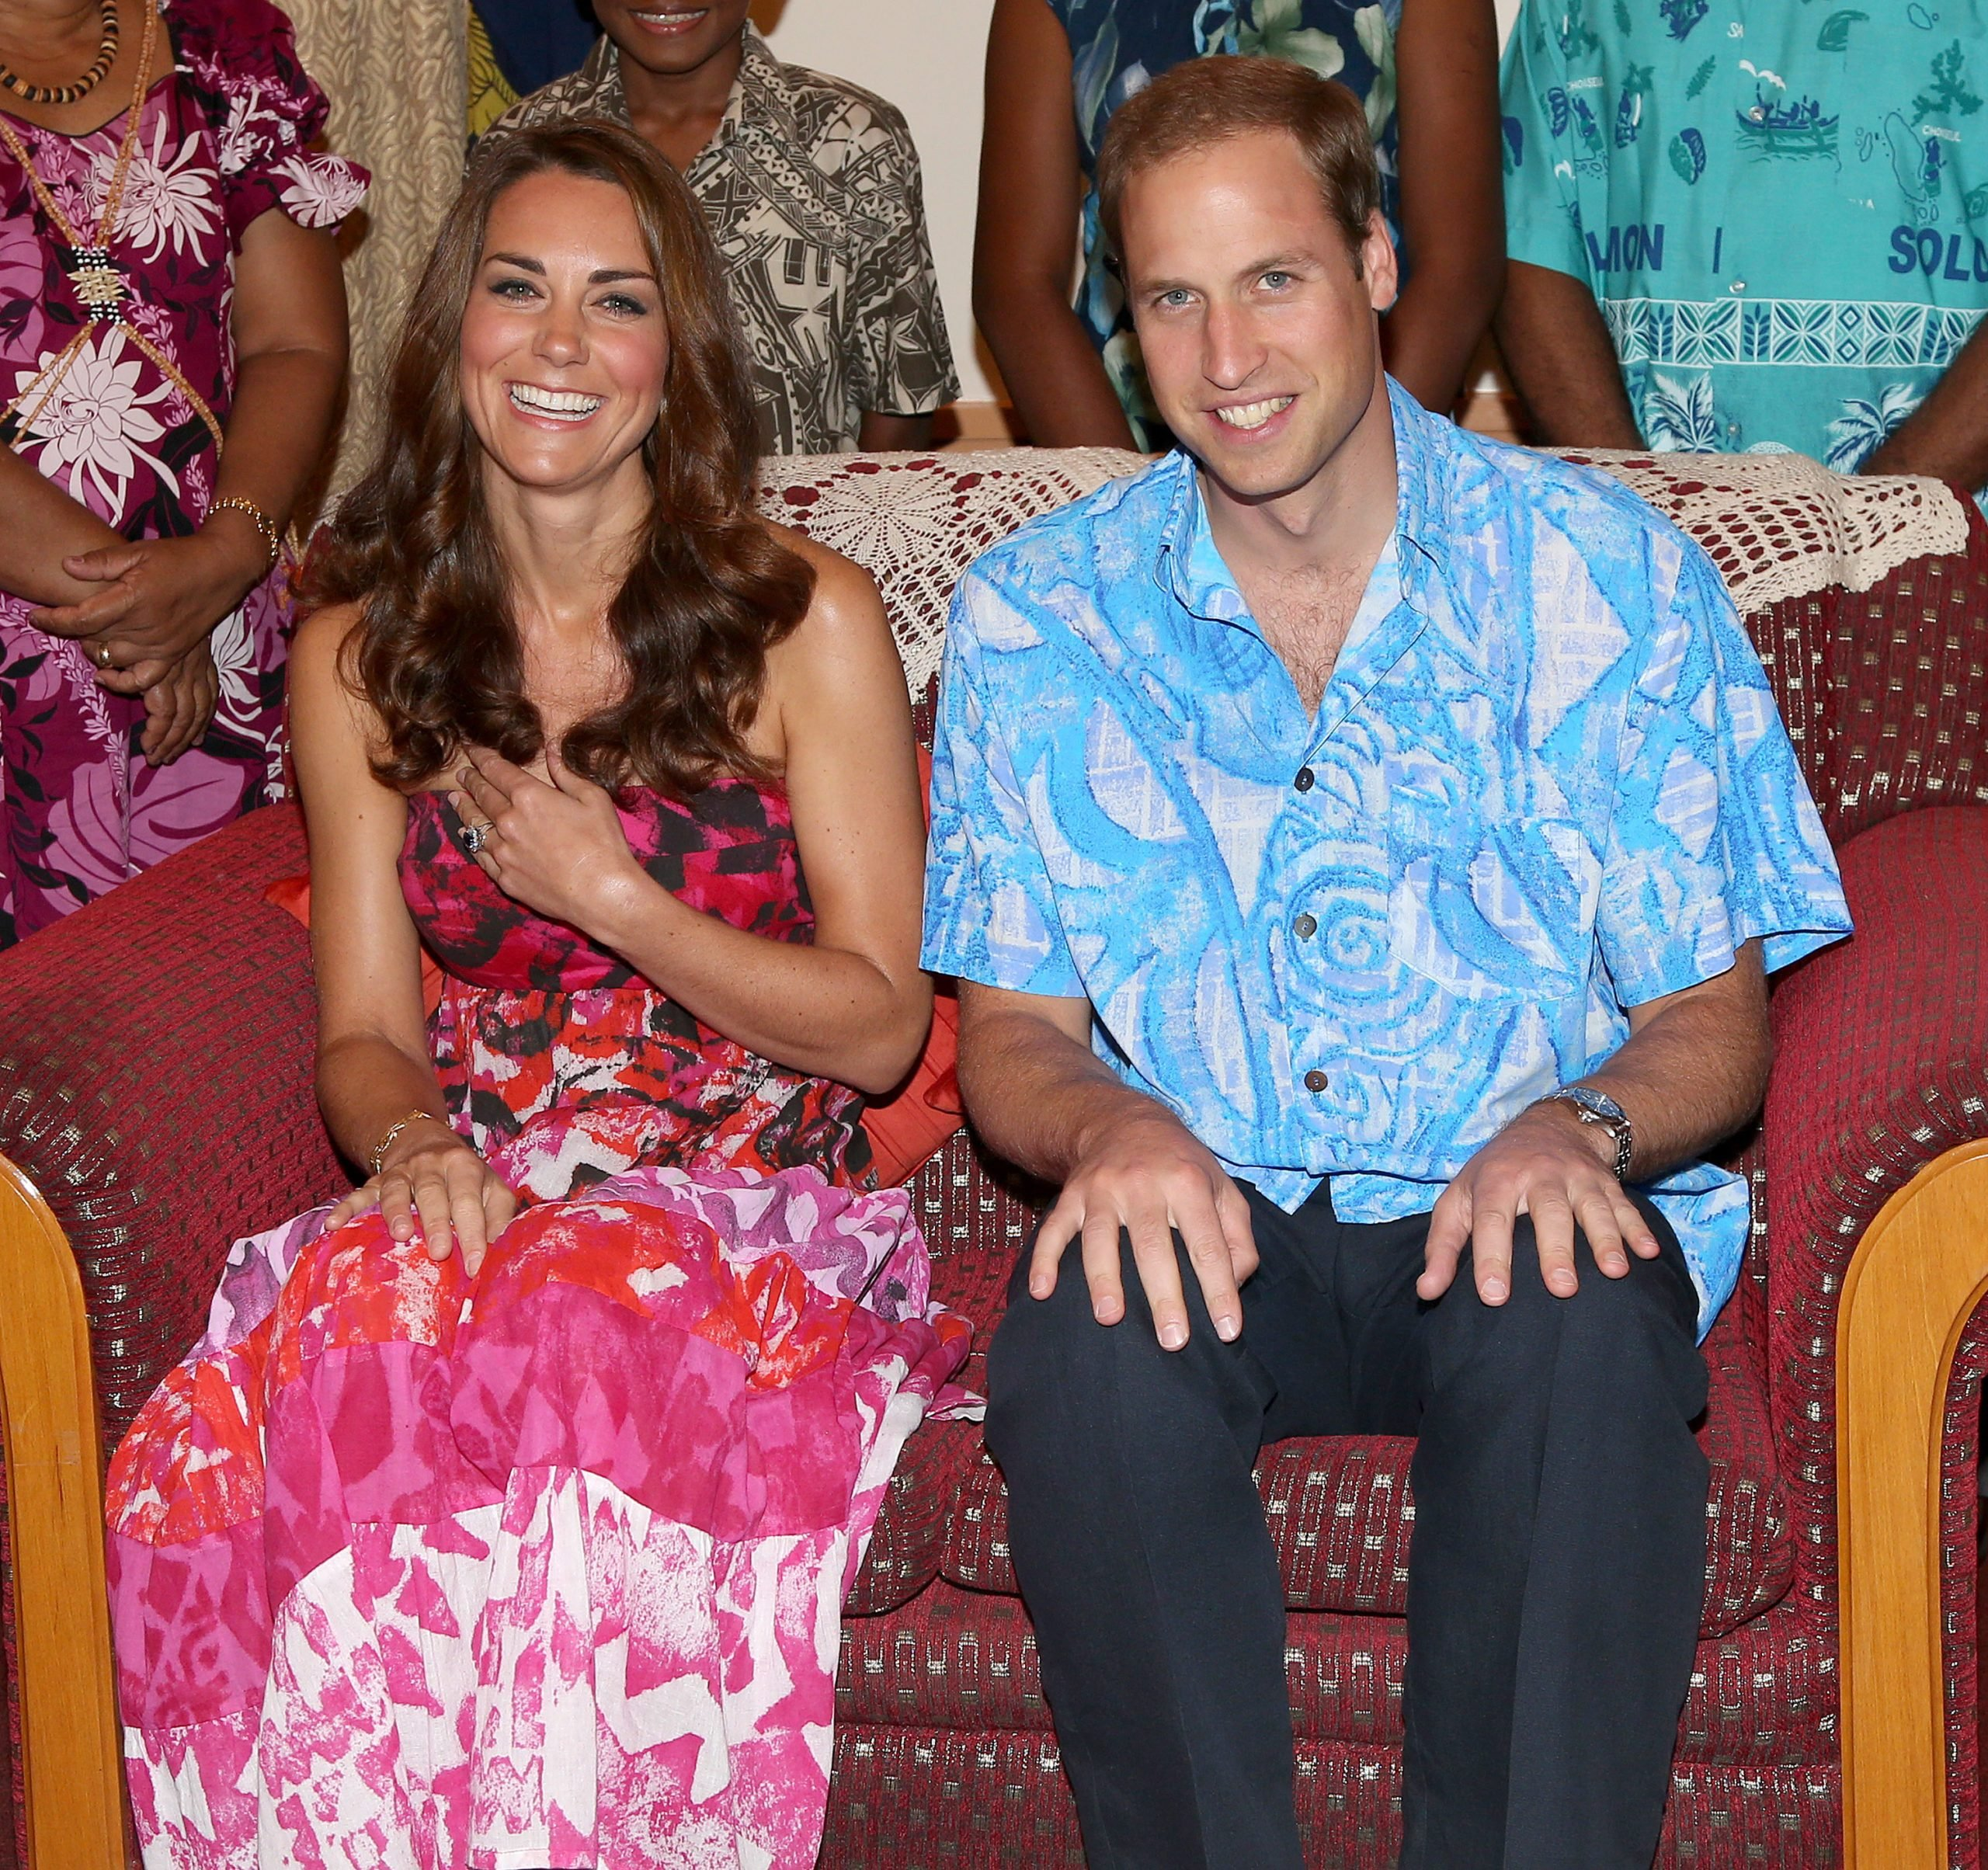 The Duke And Duchess Of Cambridge Diamond Jubilee Tour - Day 6